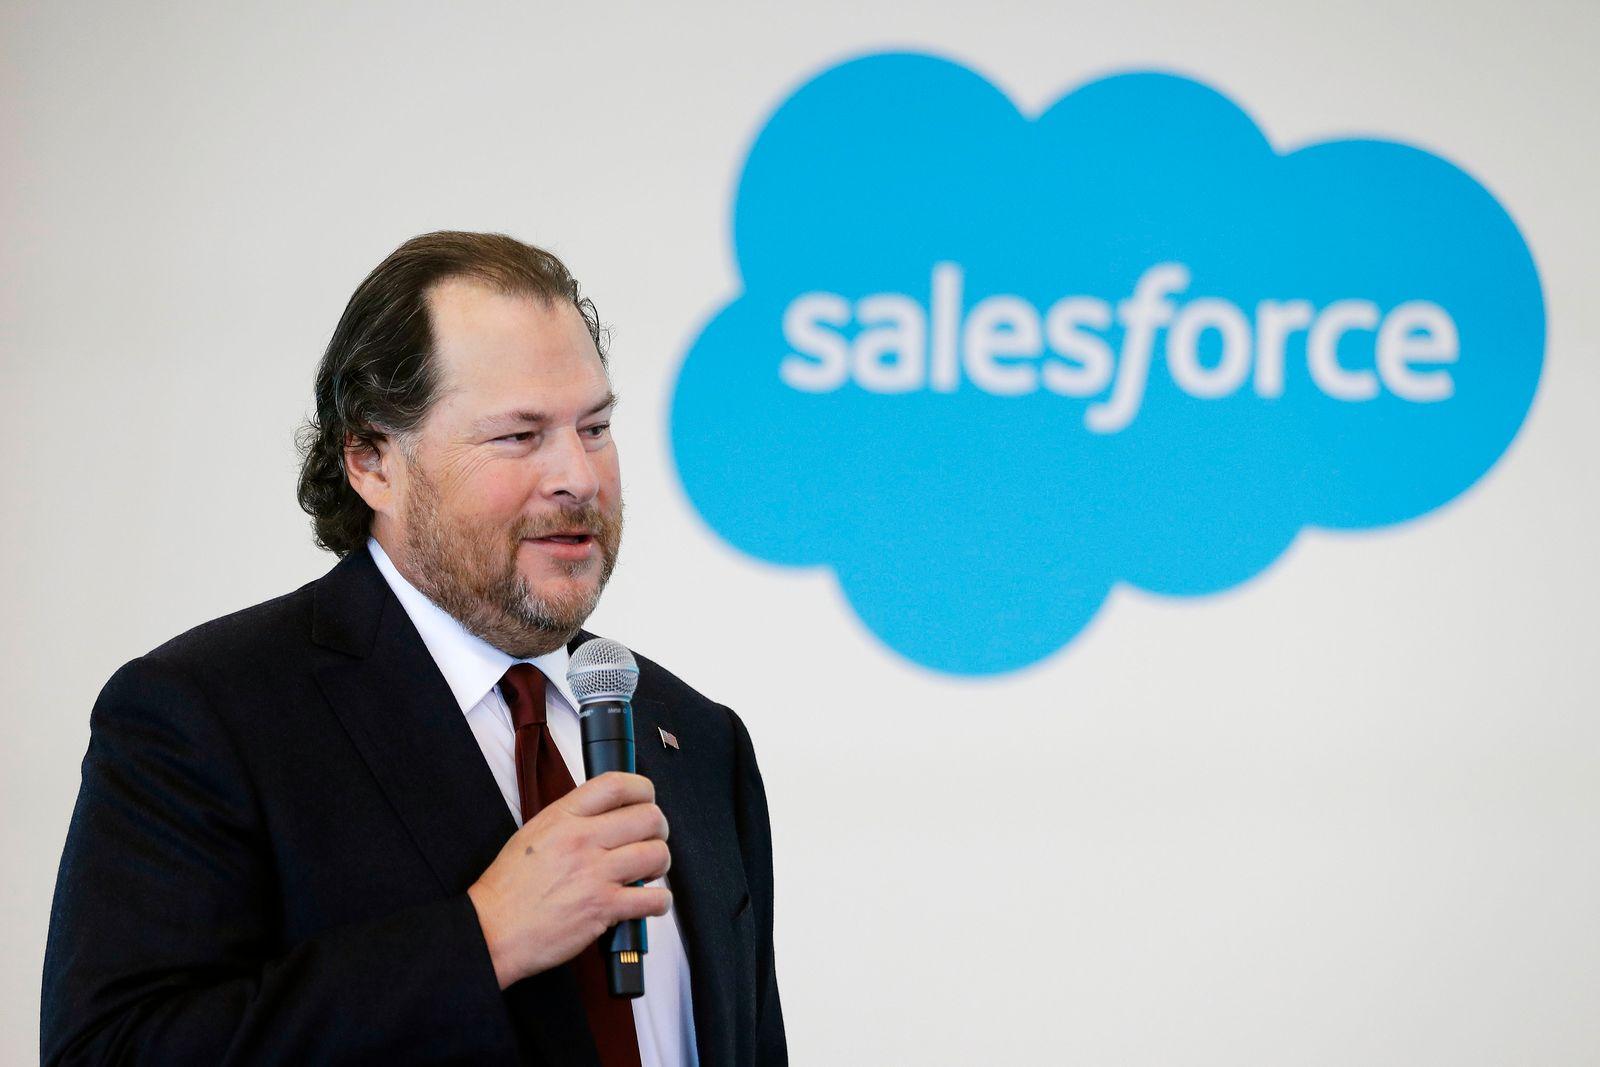 SAP-Rivale Salesforce übernimmt Slack für 27,7 Milliarden Dollar